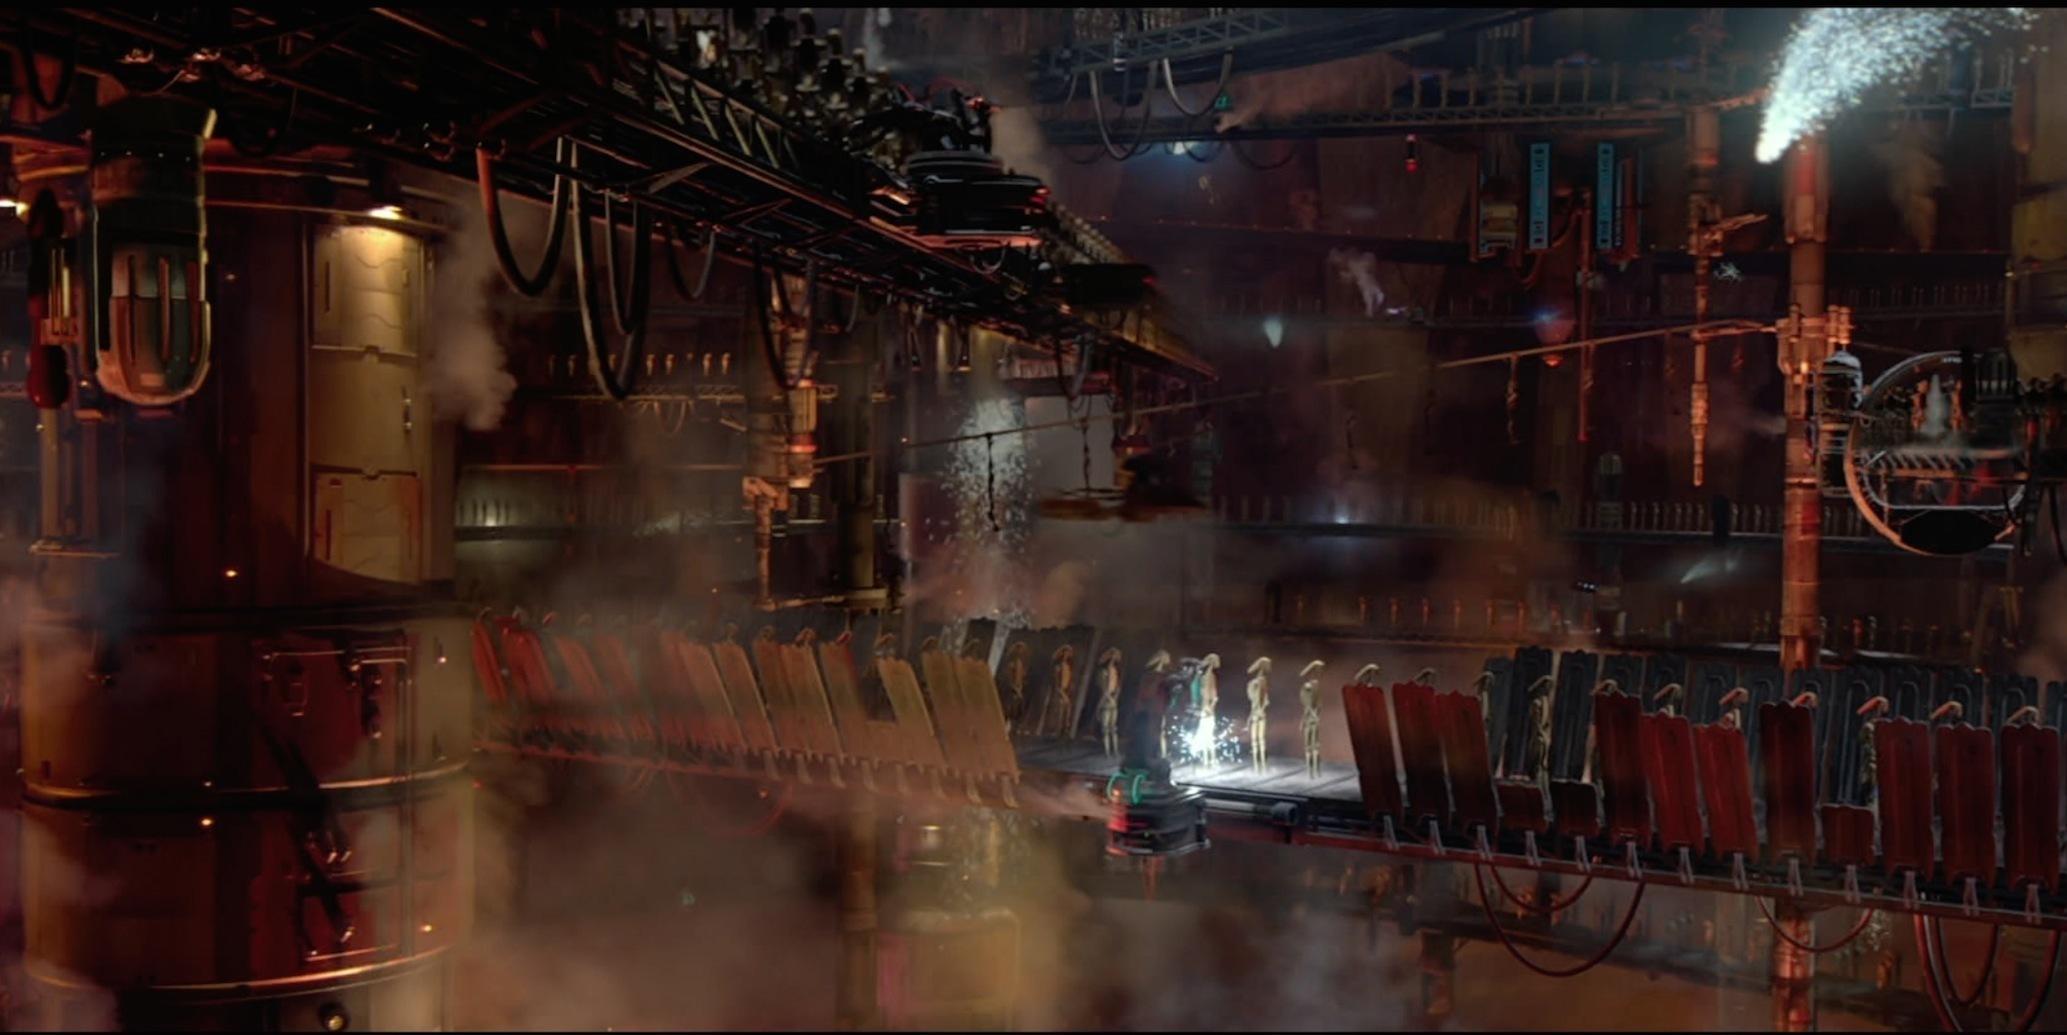 Droid Factory - Portal